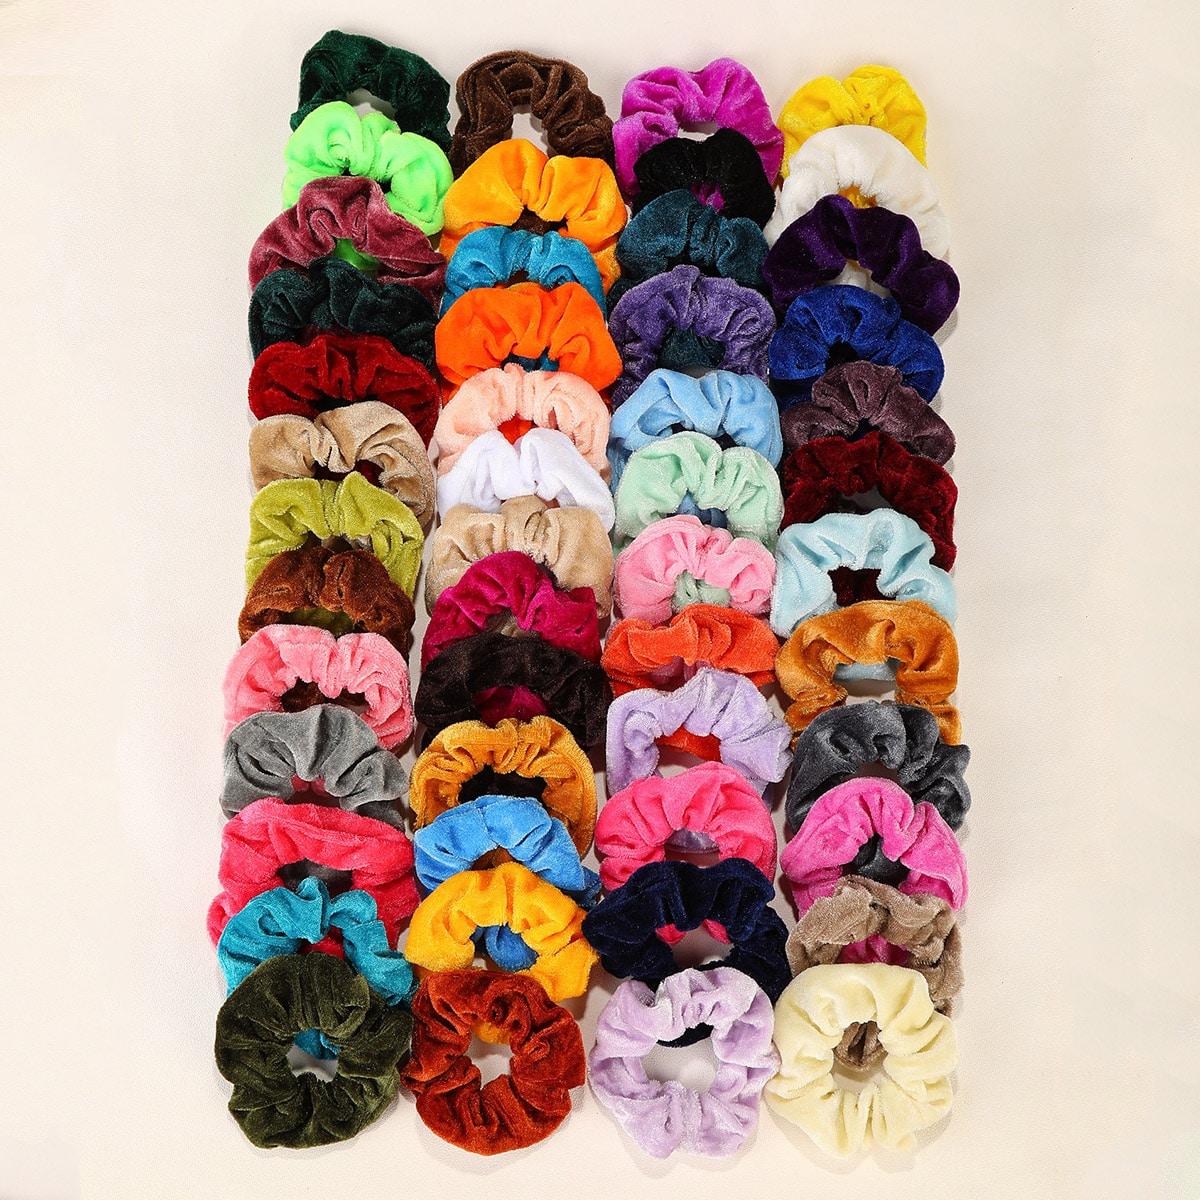 50pcs Colorful Velvet Scrunchie